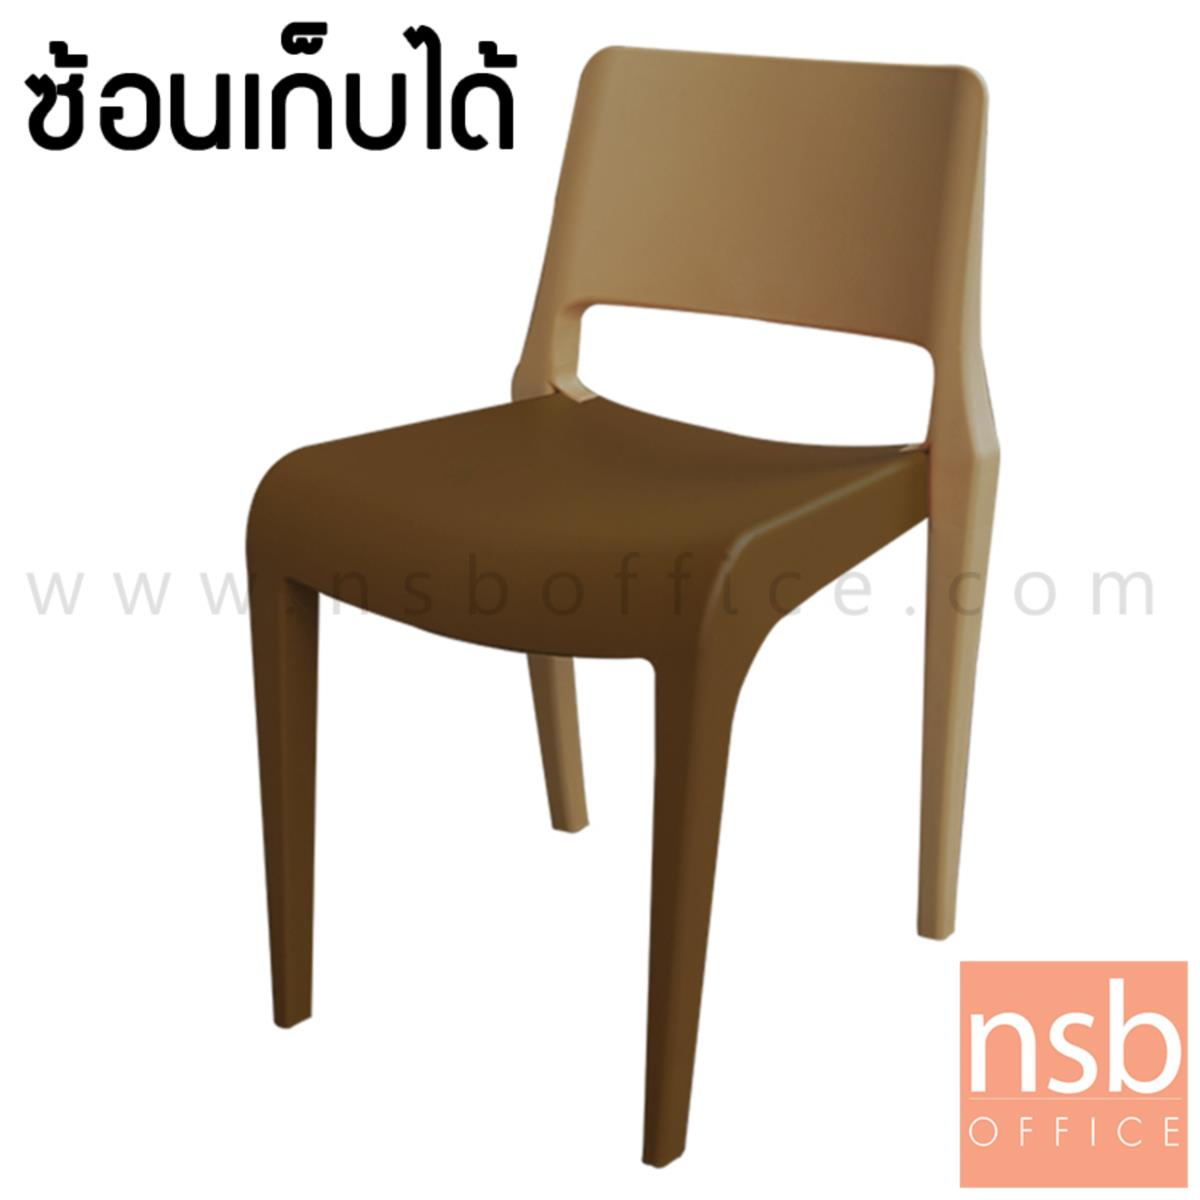 B29A149:เก้าอี้โมเดิร์นพลาสติกล้วน(PP)สีสันทูโทน รุ่น PON-PN9132/1  ขนาด 48W cm.